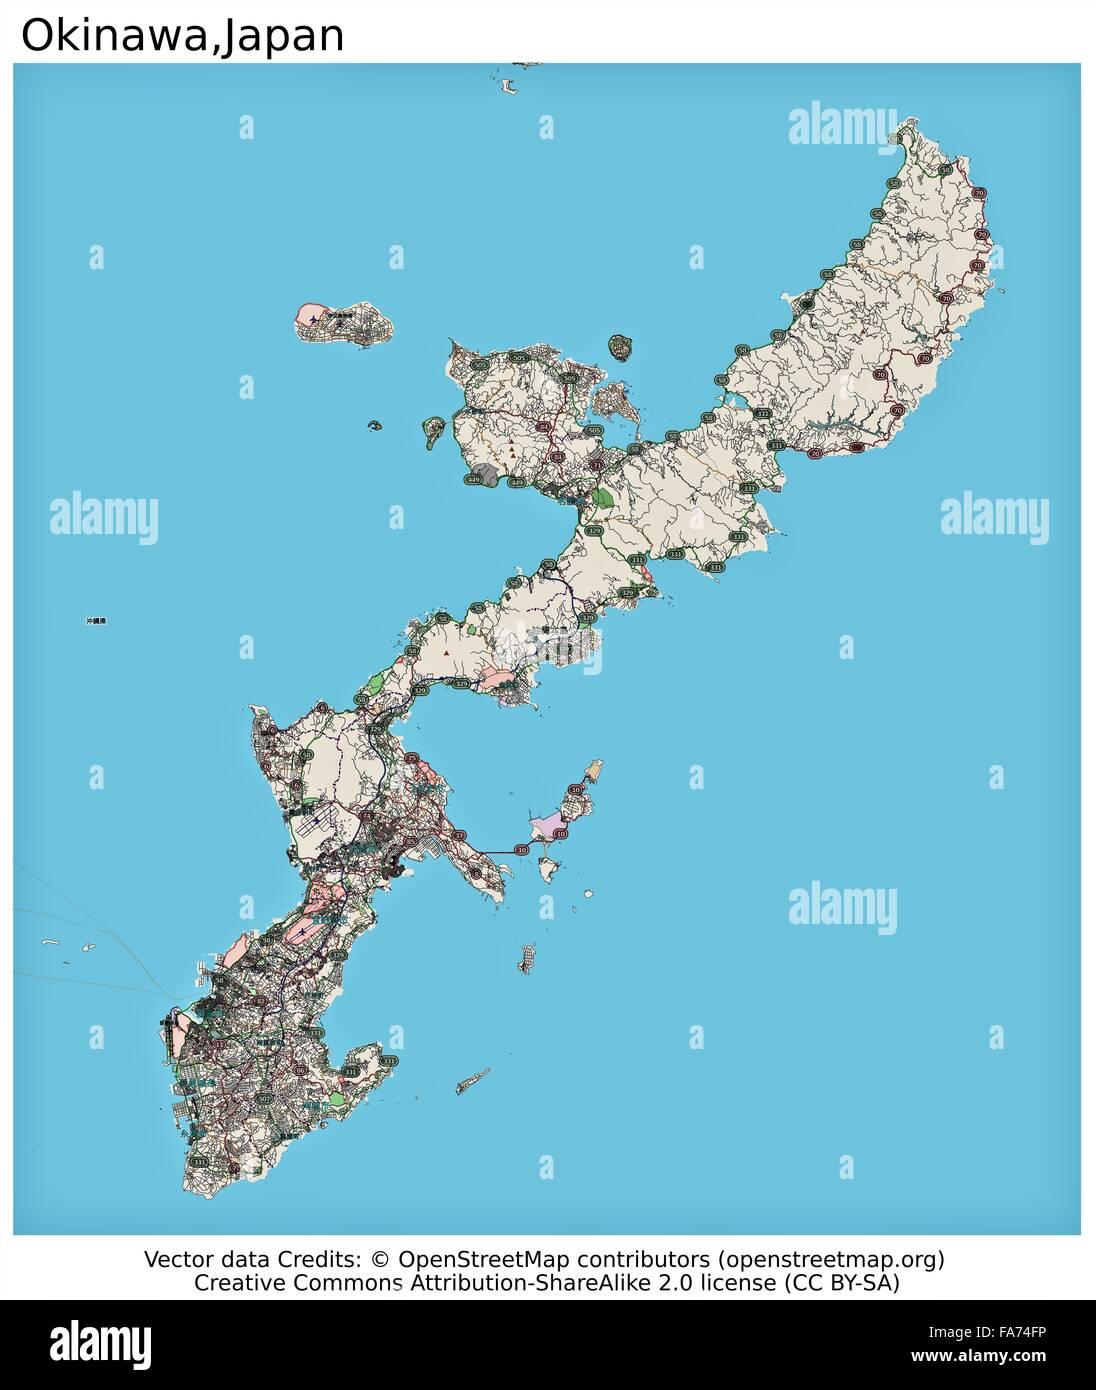 Okinawa Japan Location Map Stock Photo 92355642 Alamy